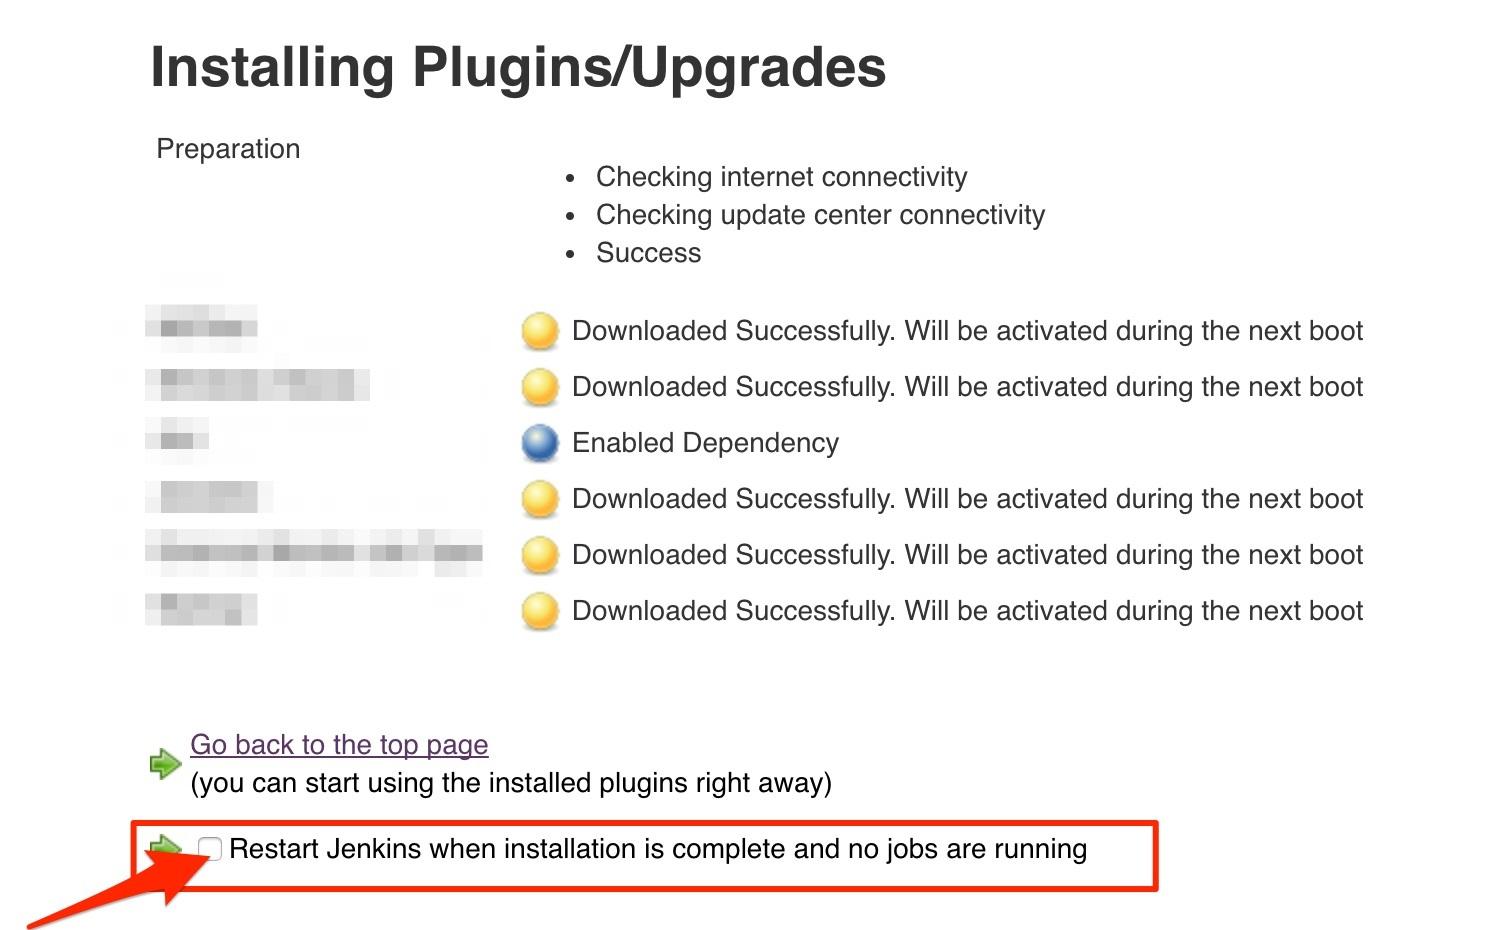 jenkins plugin install thinbackup